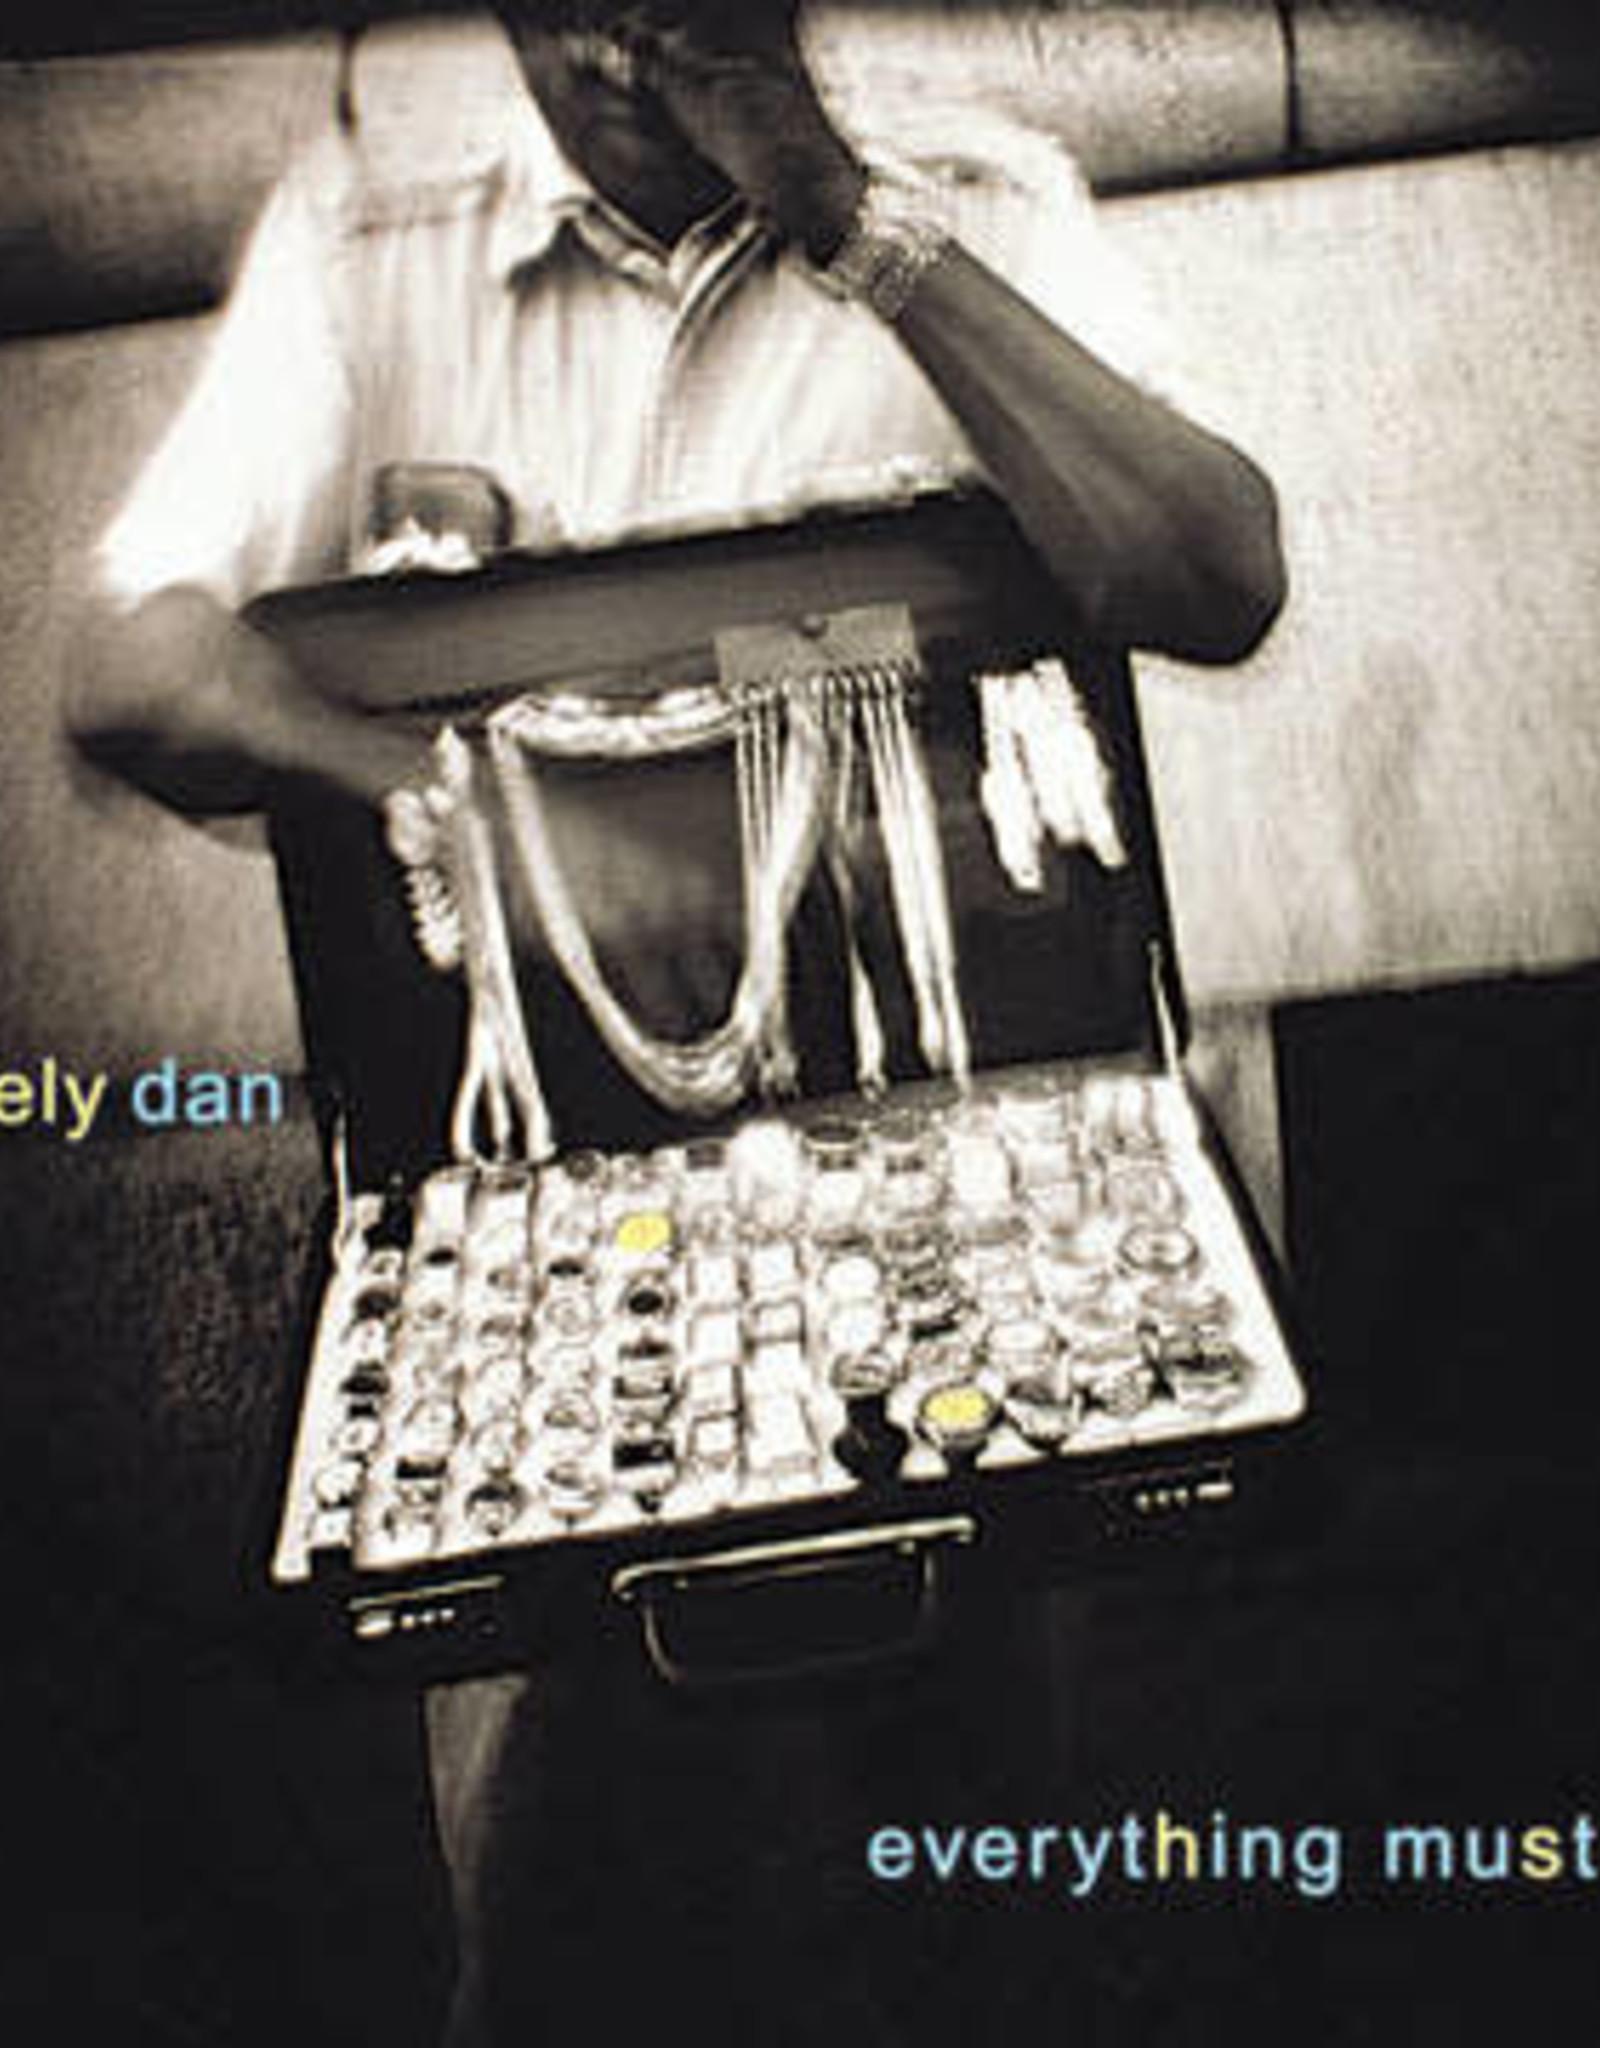 Steely Dan - Everything Must Go (RSD 6/21)